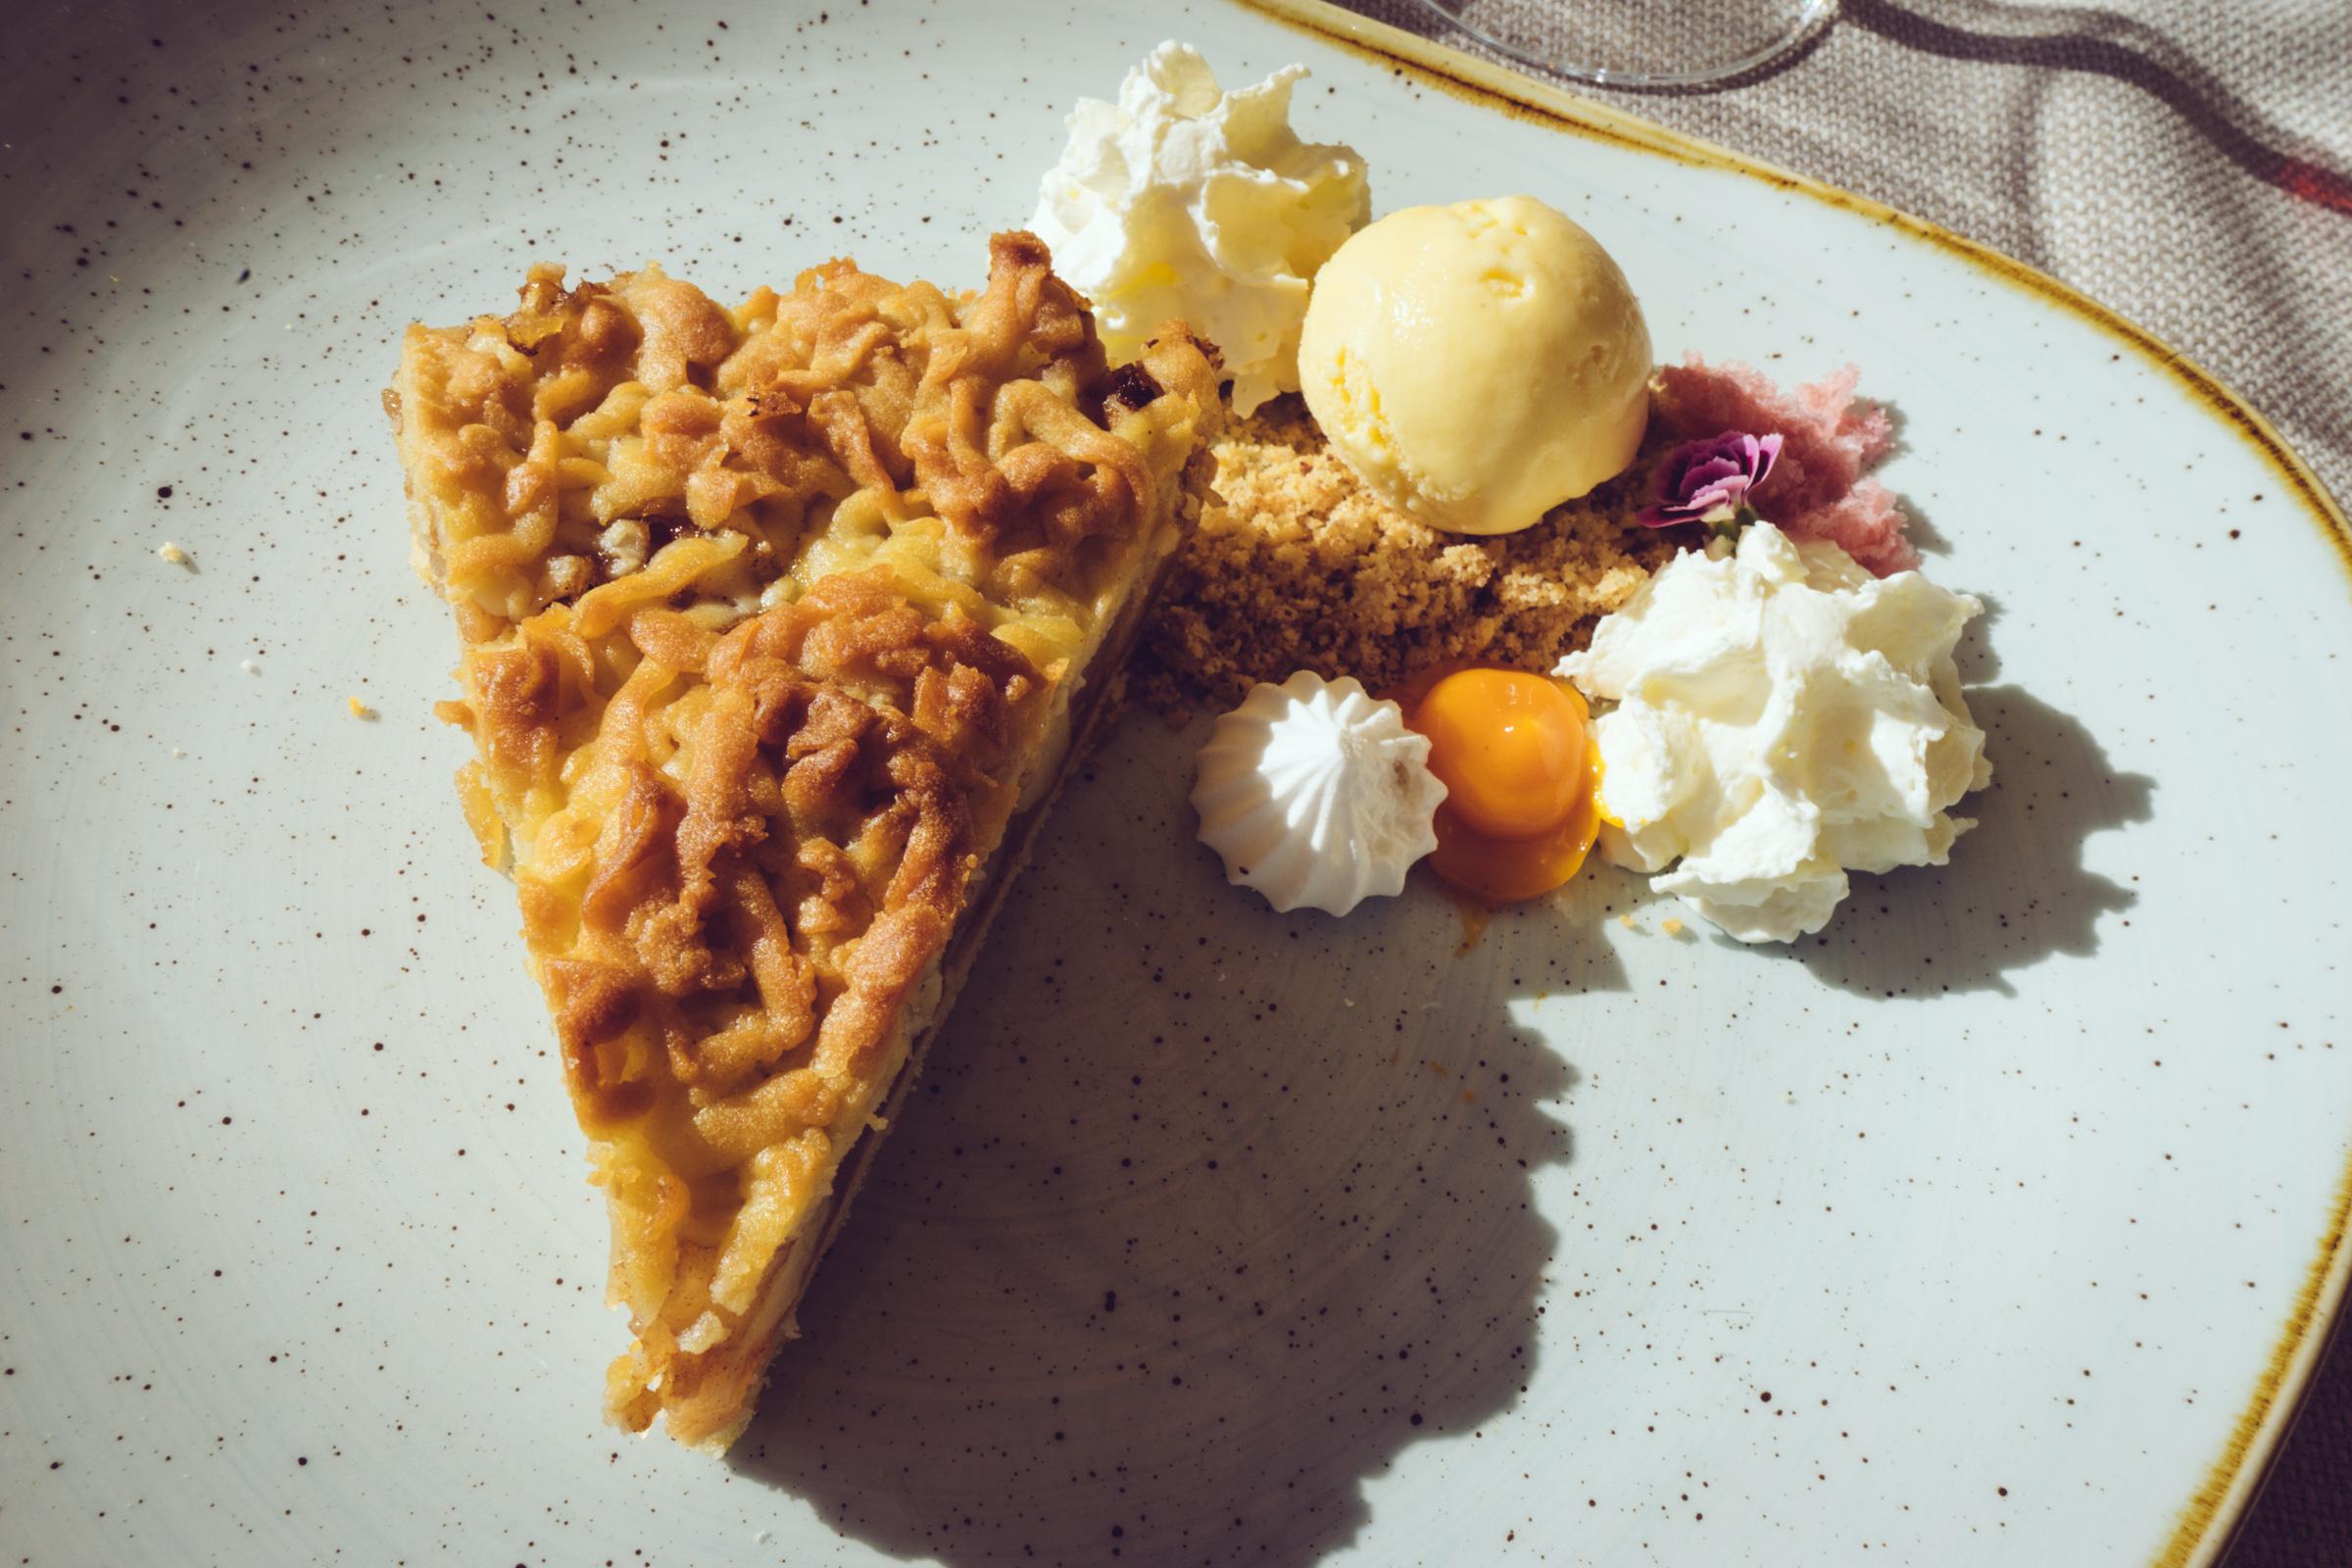 Le dessert au restaurant Kubicki de Gdansk - Pologne